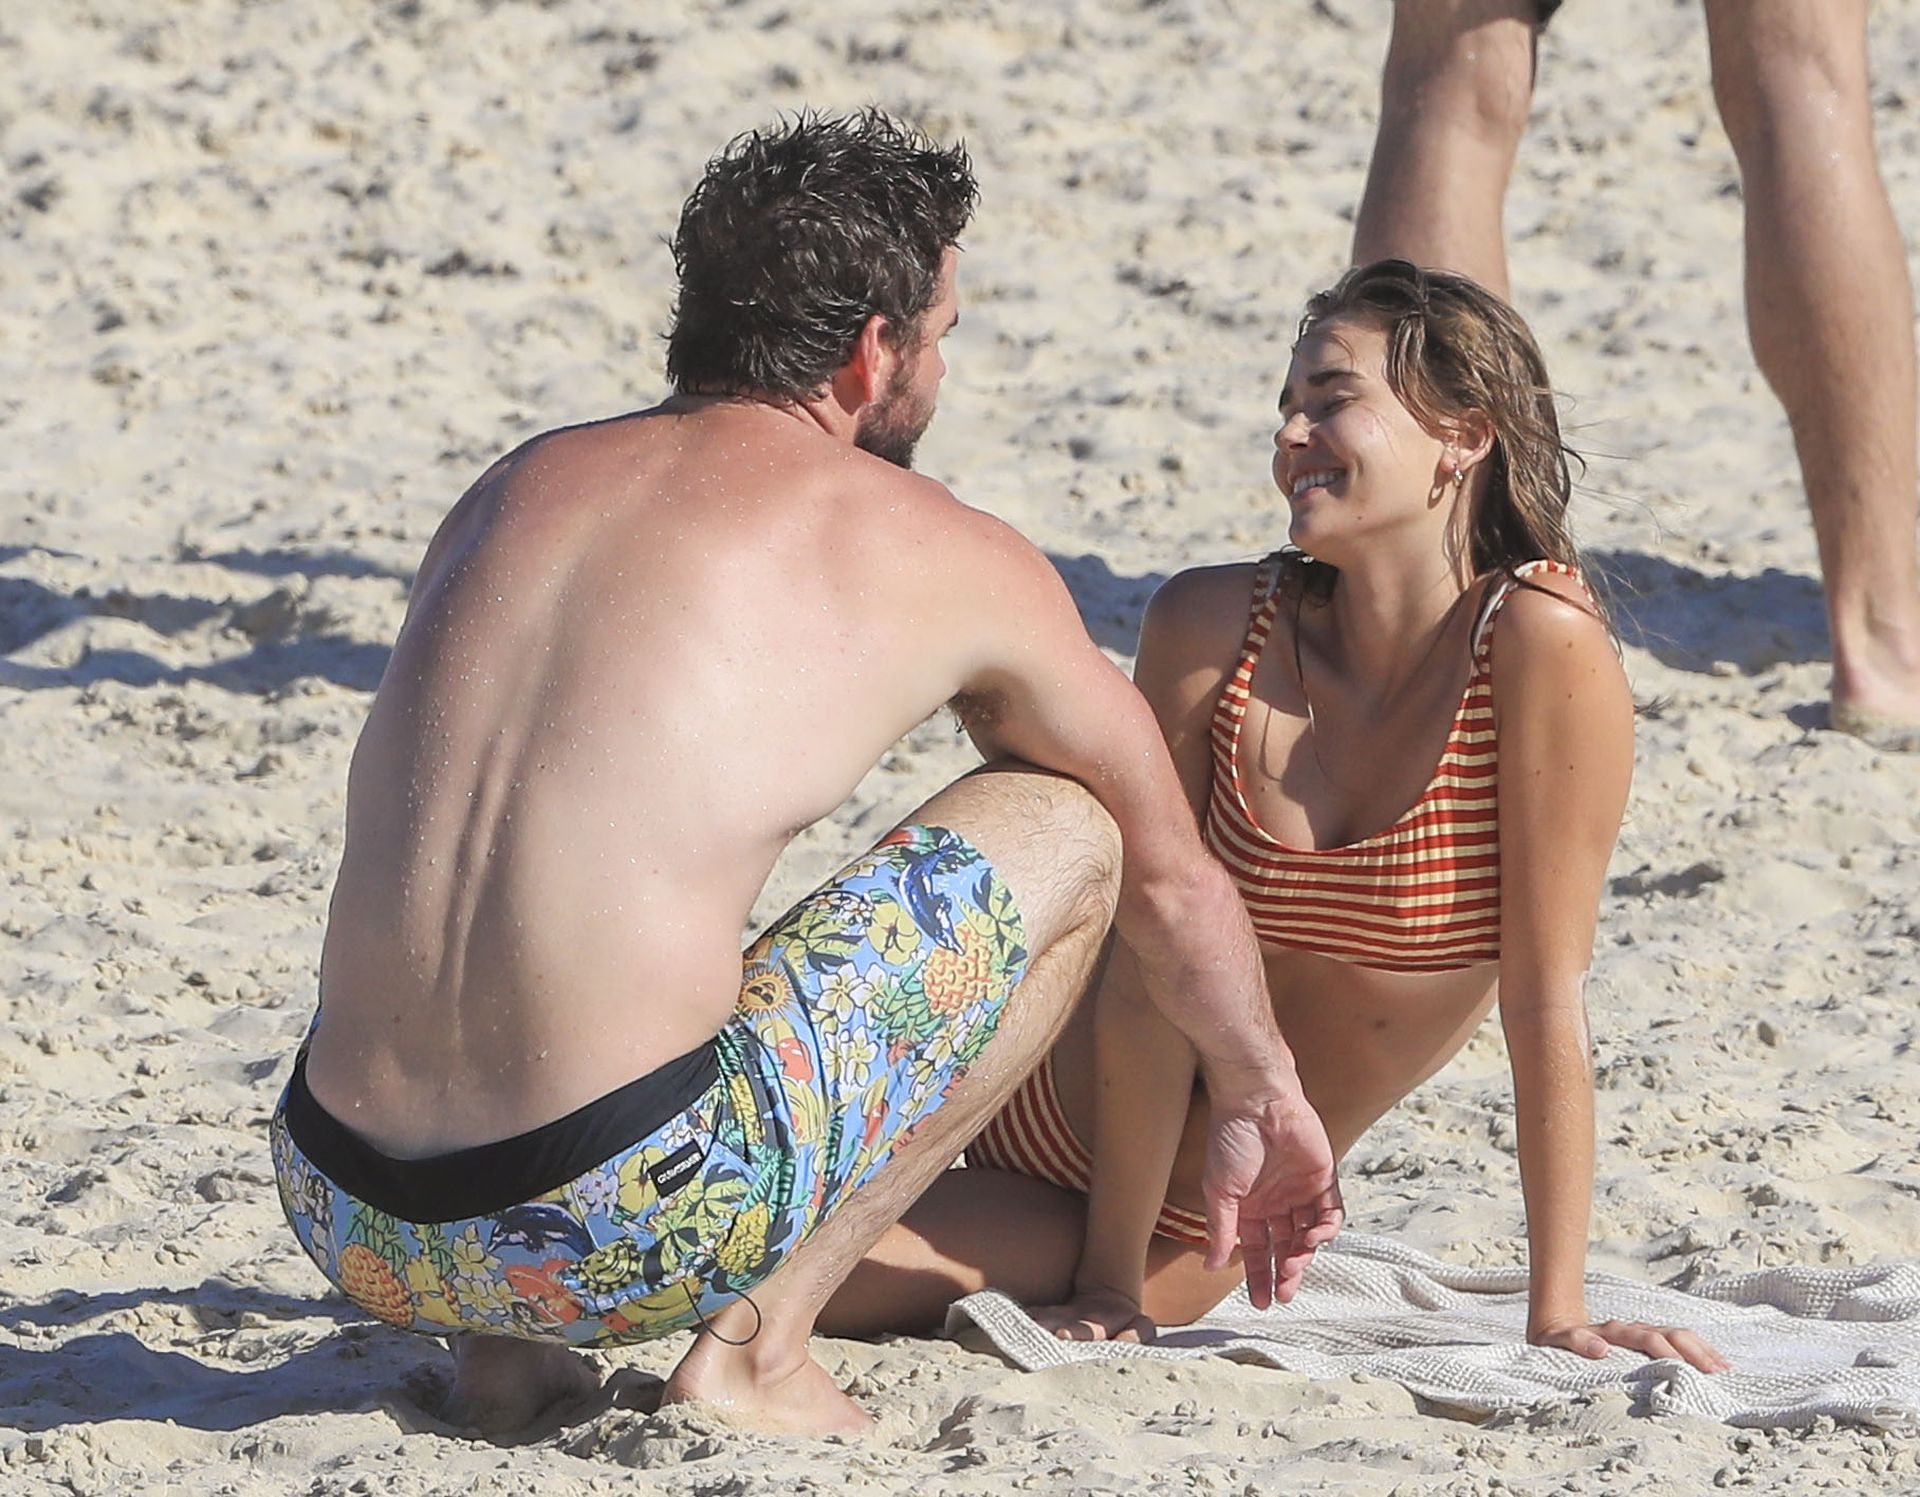 Gabriella Brooks Hot – Liam Hemsworth's New Girlfriend 0013